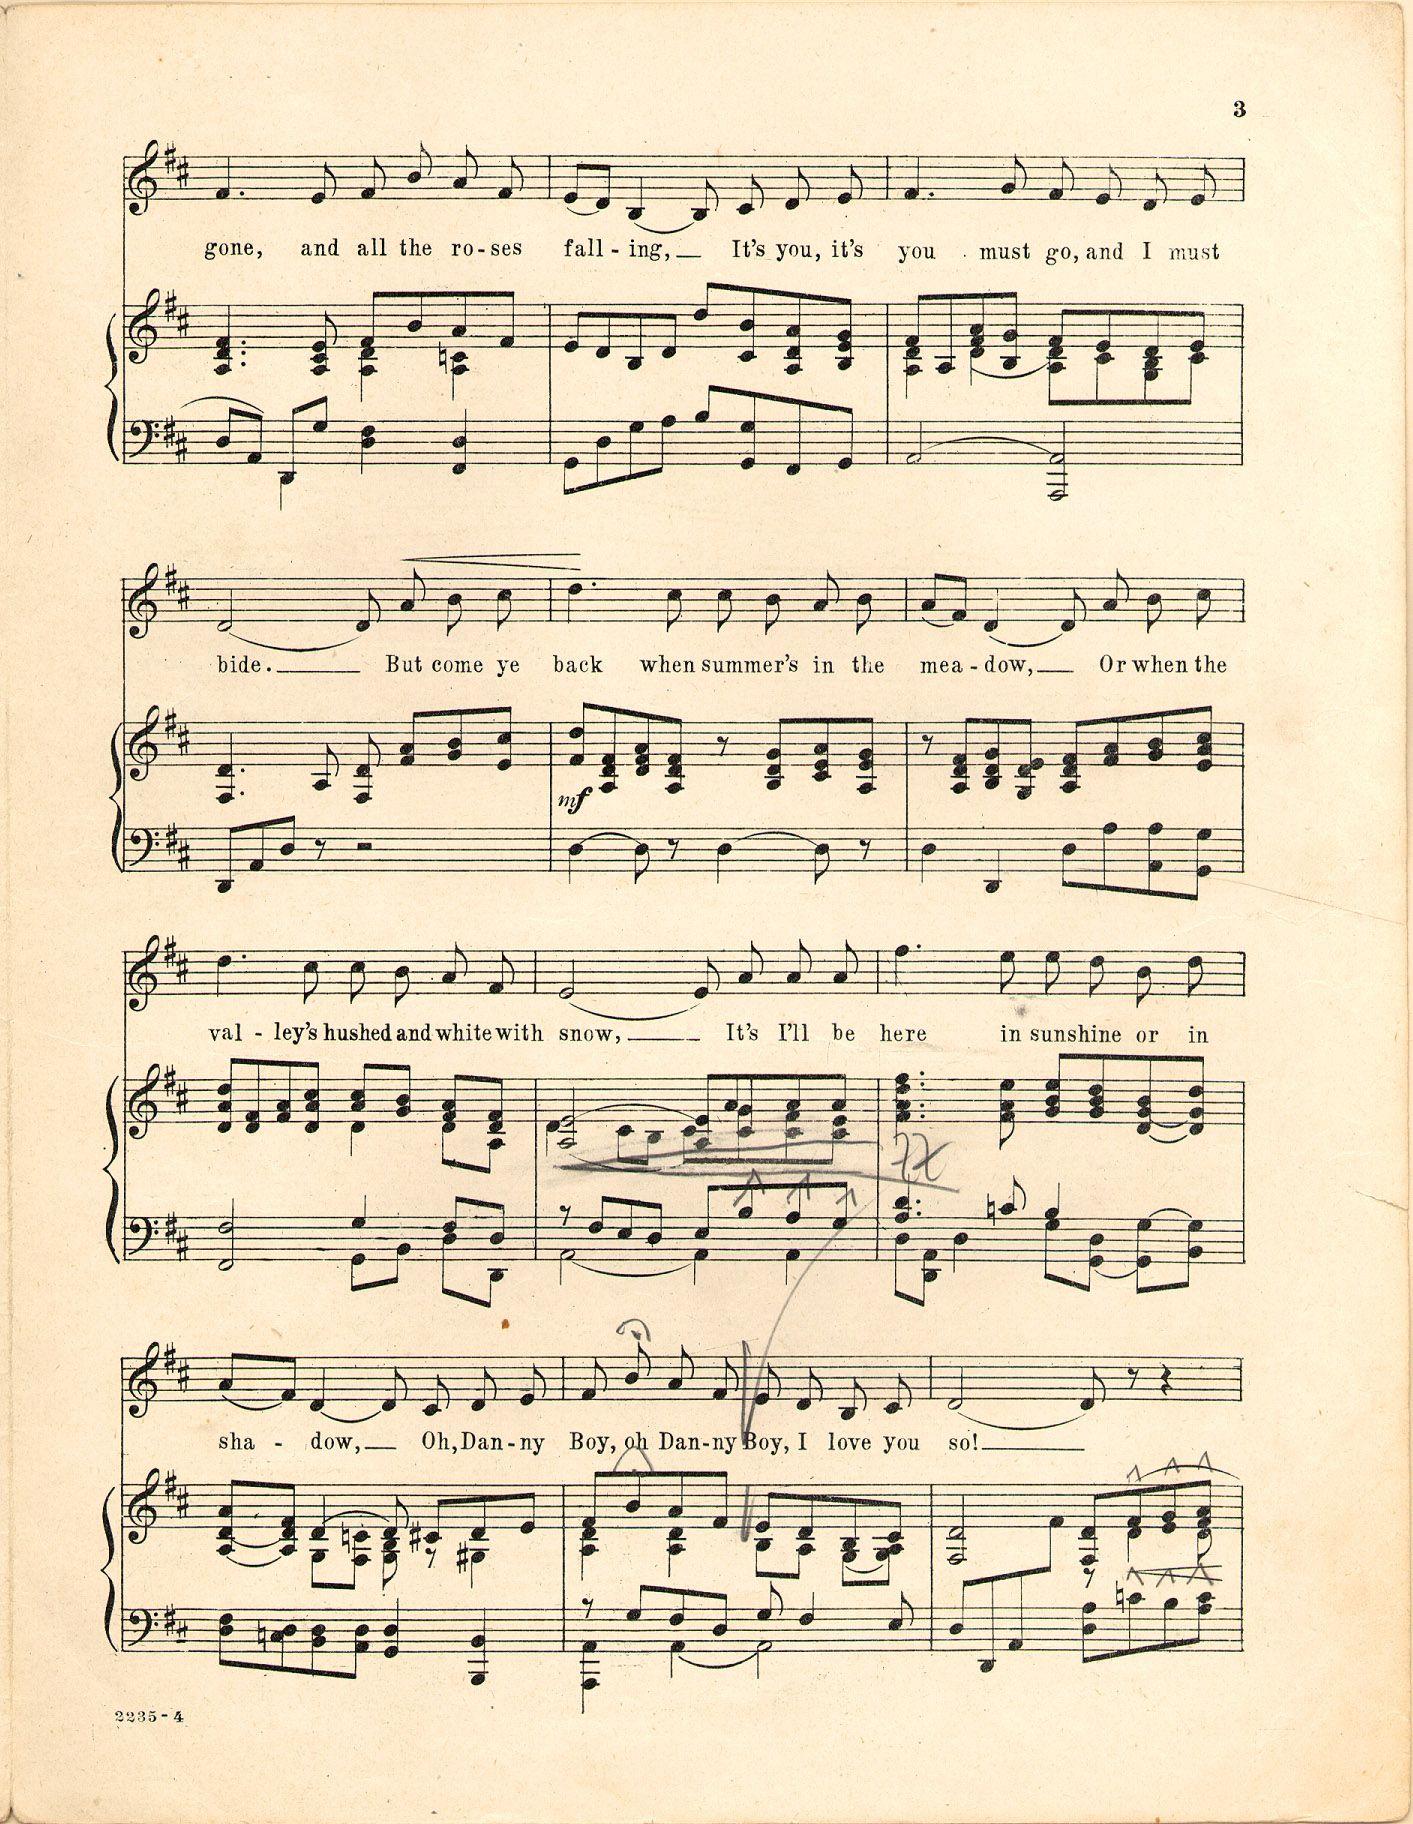 Danny boy; Old Irish air - Music sheet | The Visual Random ...